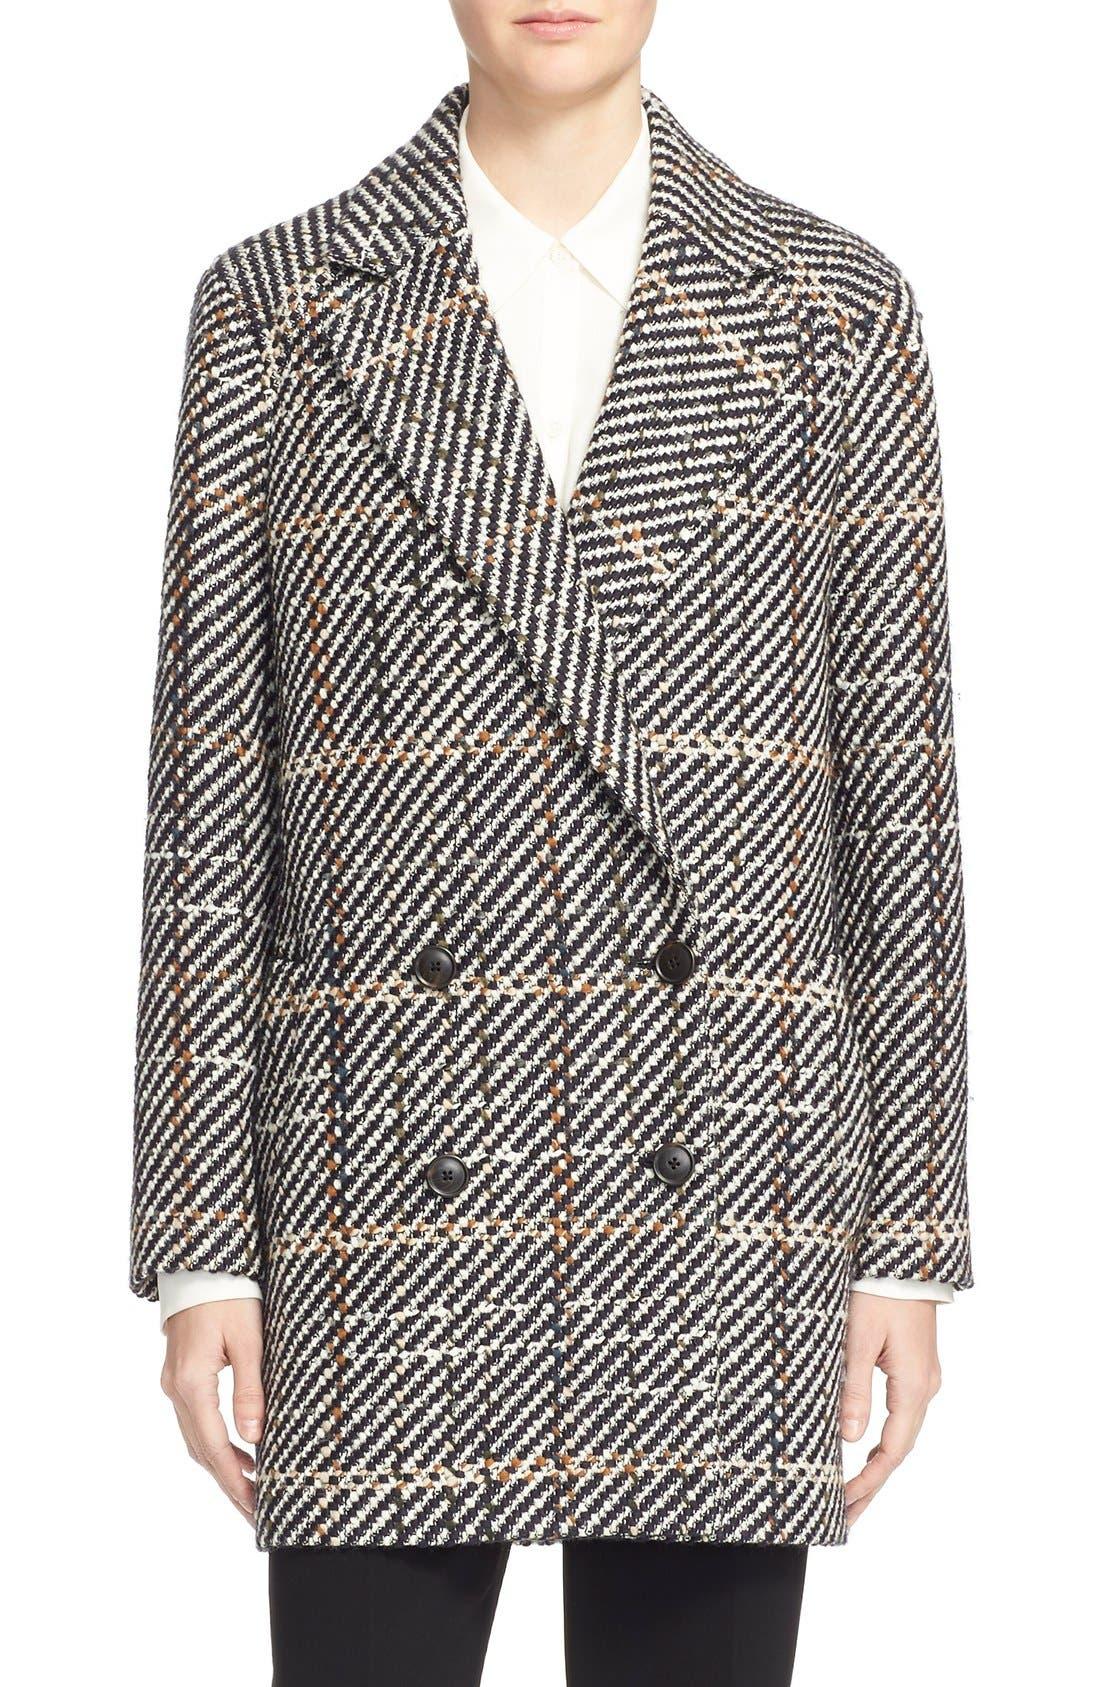 Main Image - Theory Graphic Tweed Coat